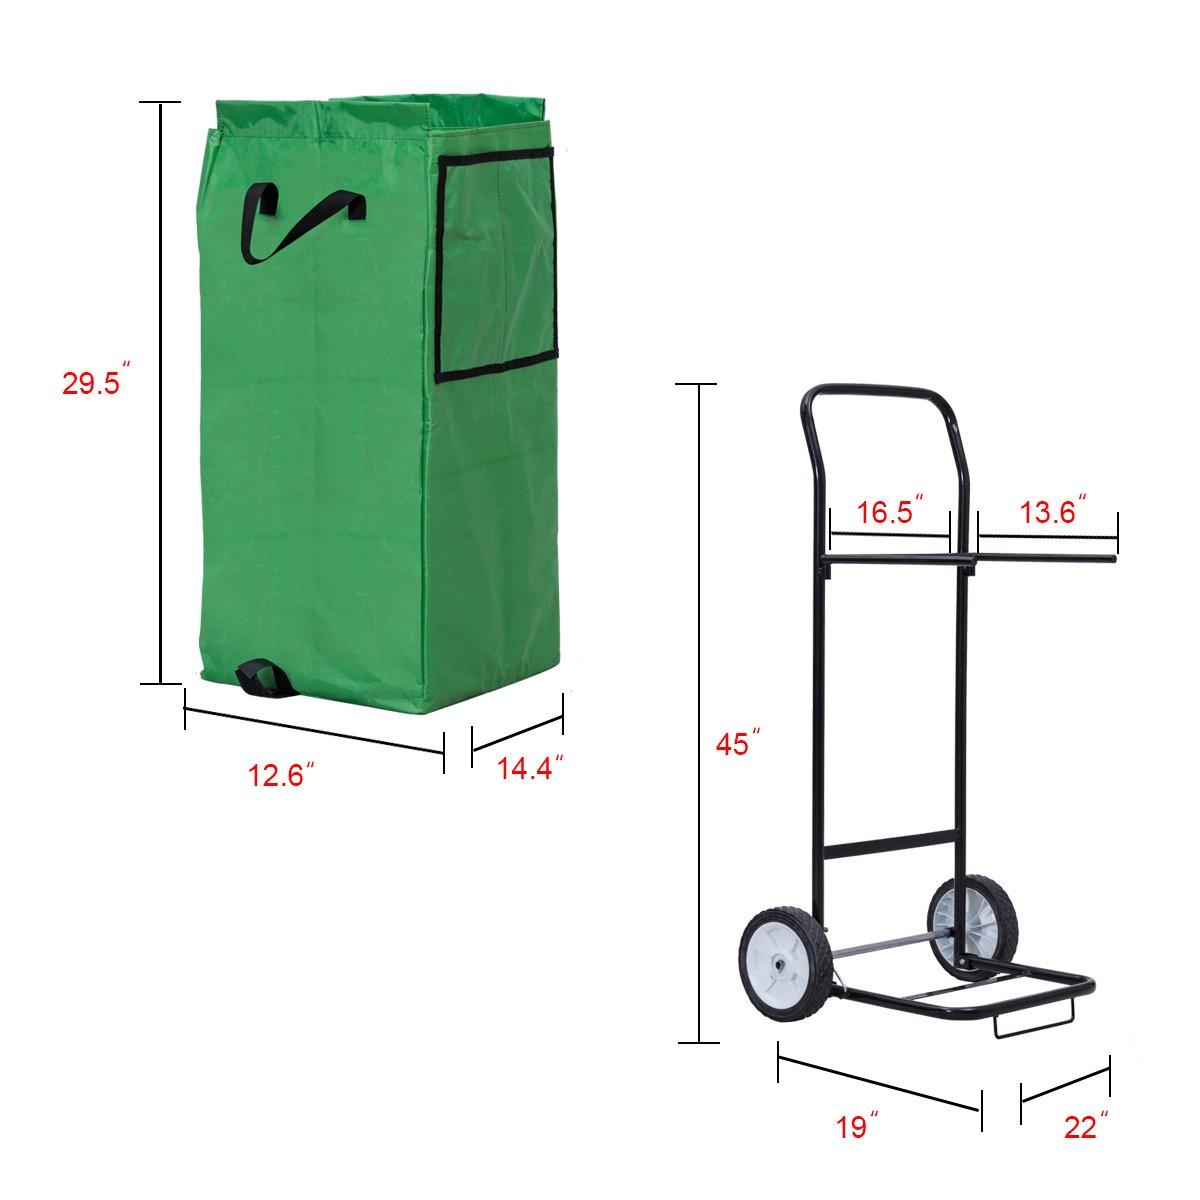 Goplus Portable Gardening Lawn Leaf Bag Detachable Tote Cart Multifunctional Folding Basket w/ Pocket Green by Goplus (Image #3)